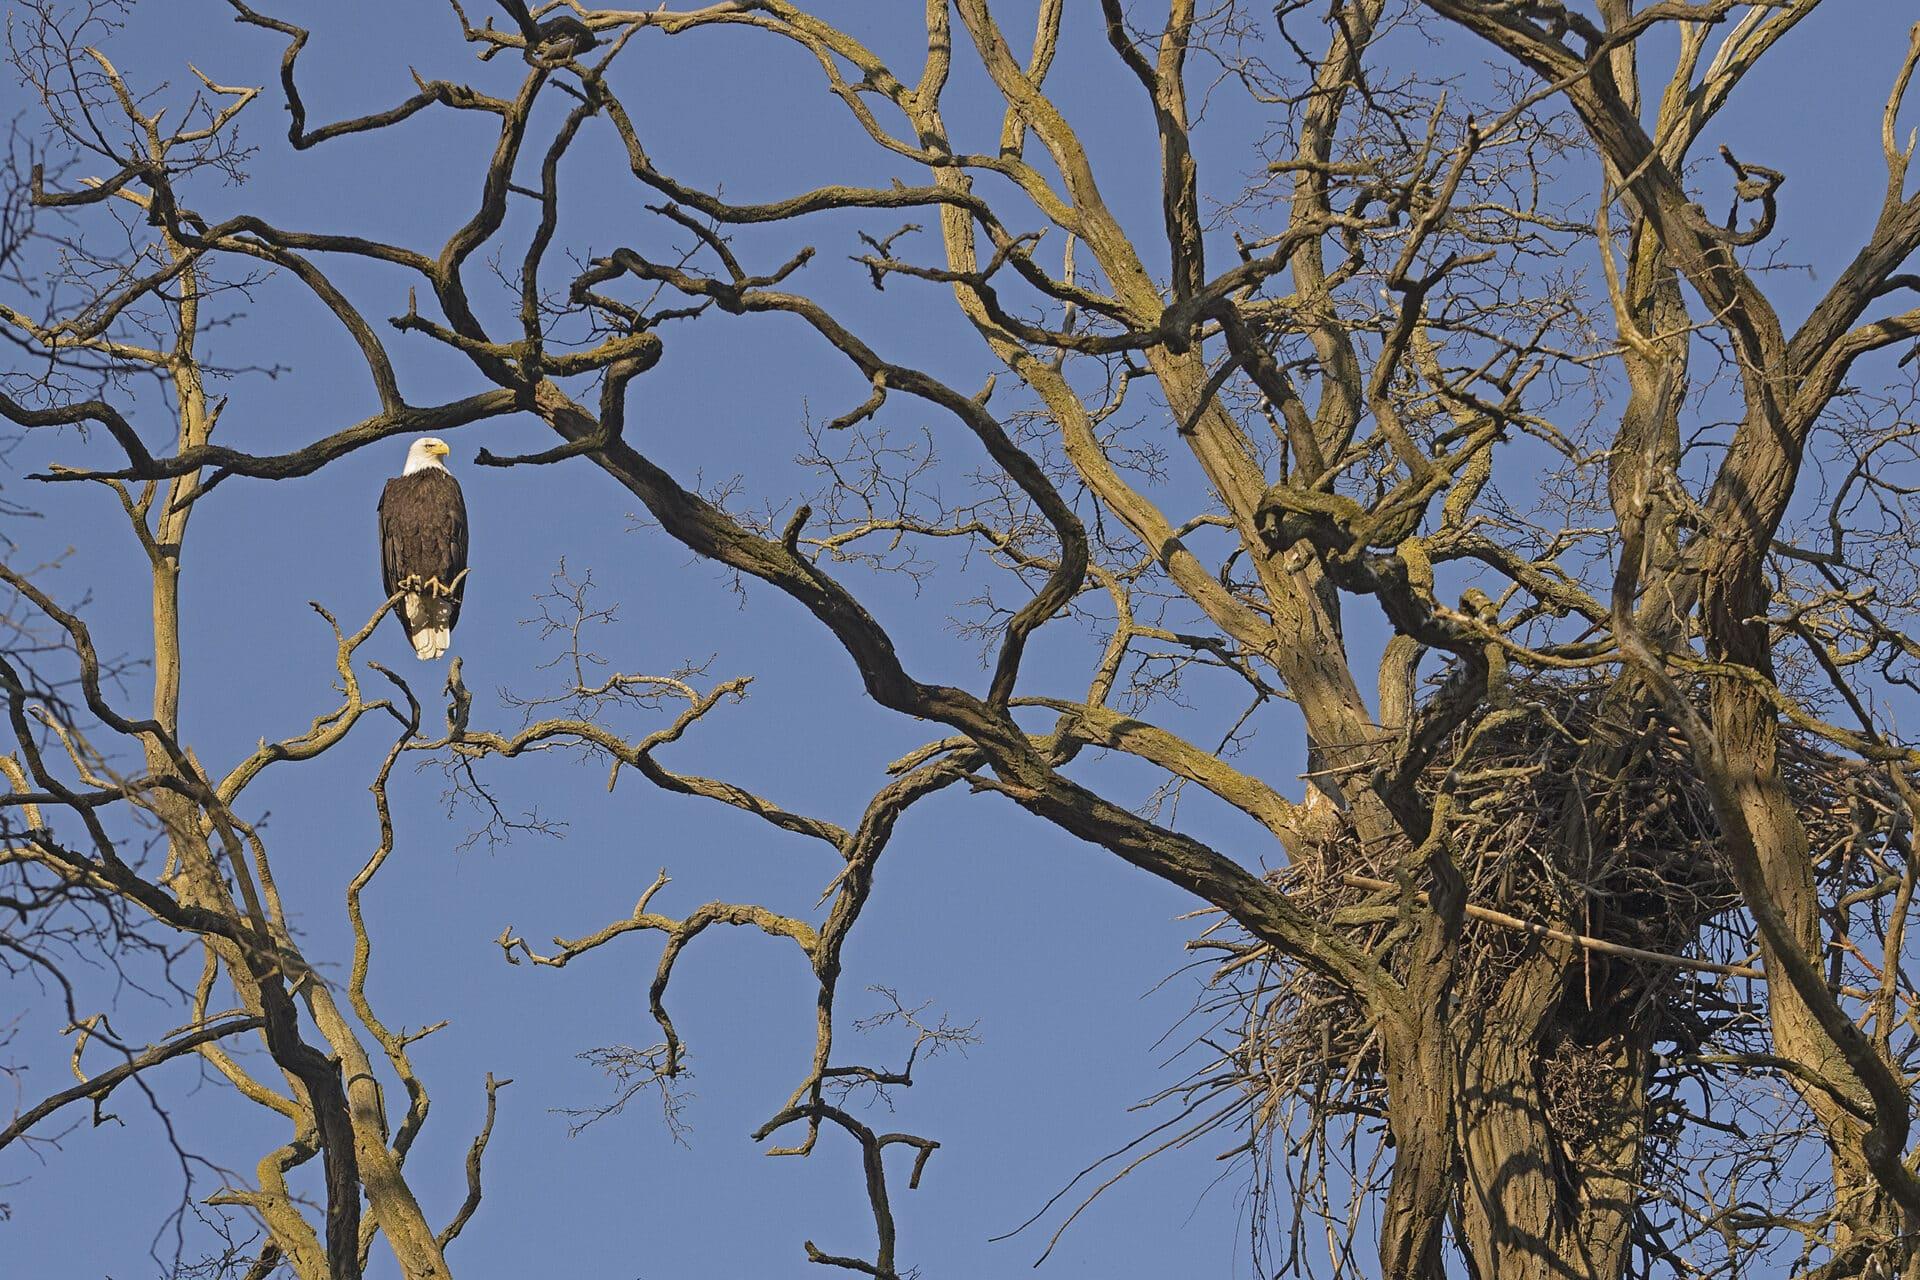 Bald Eagle and Nest, April 17, 2021